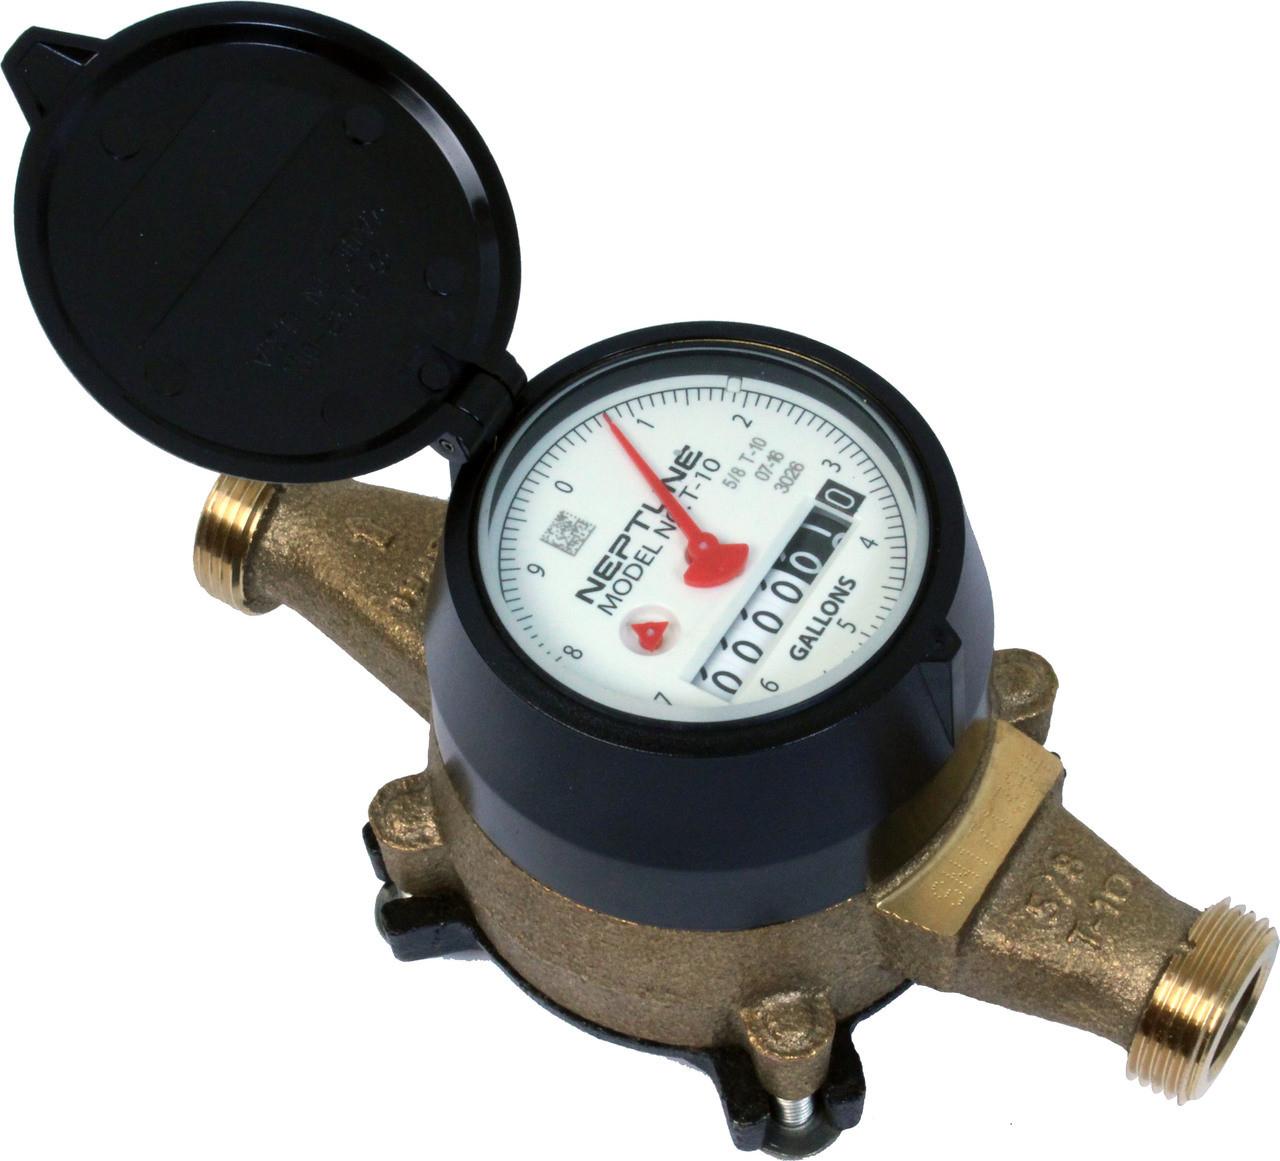 Diagram Of A Water Meter